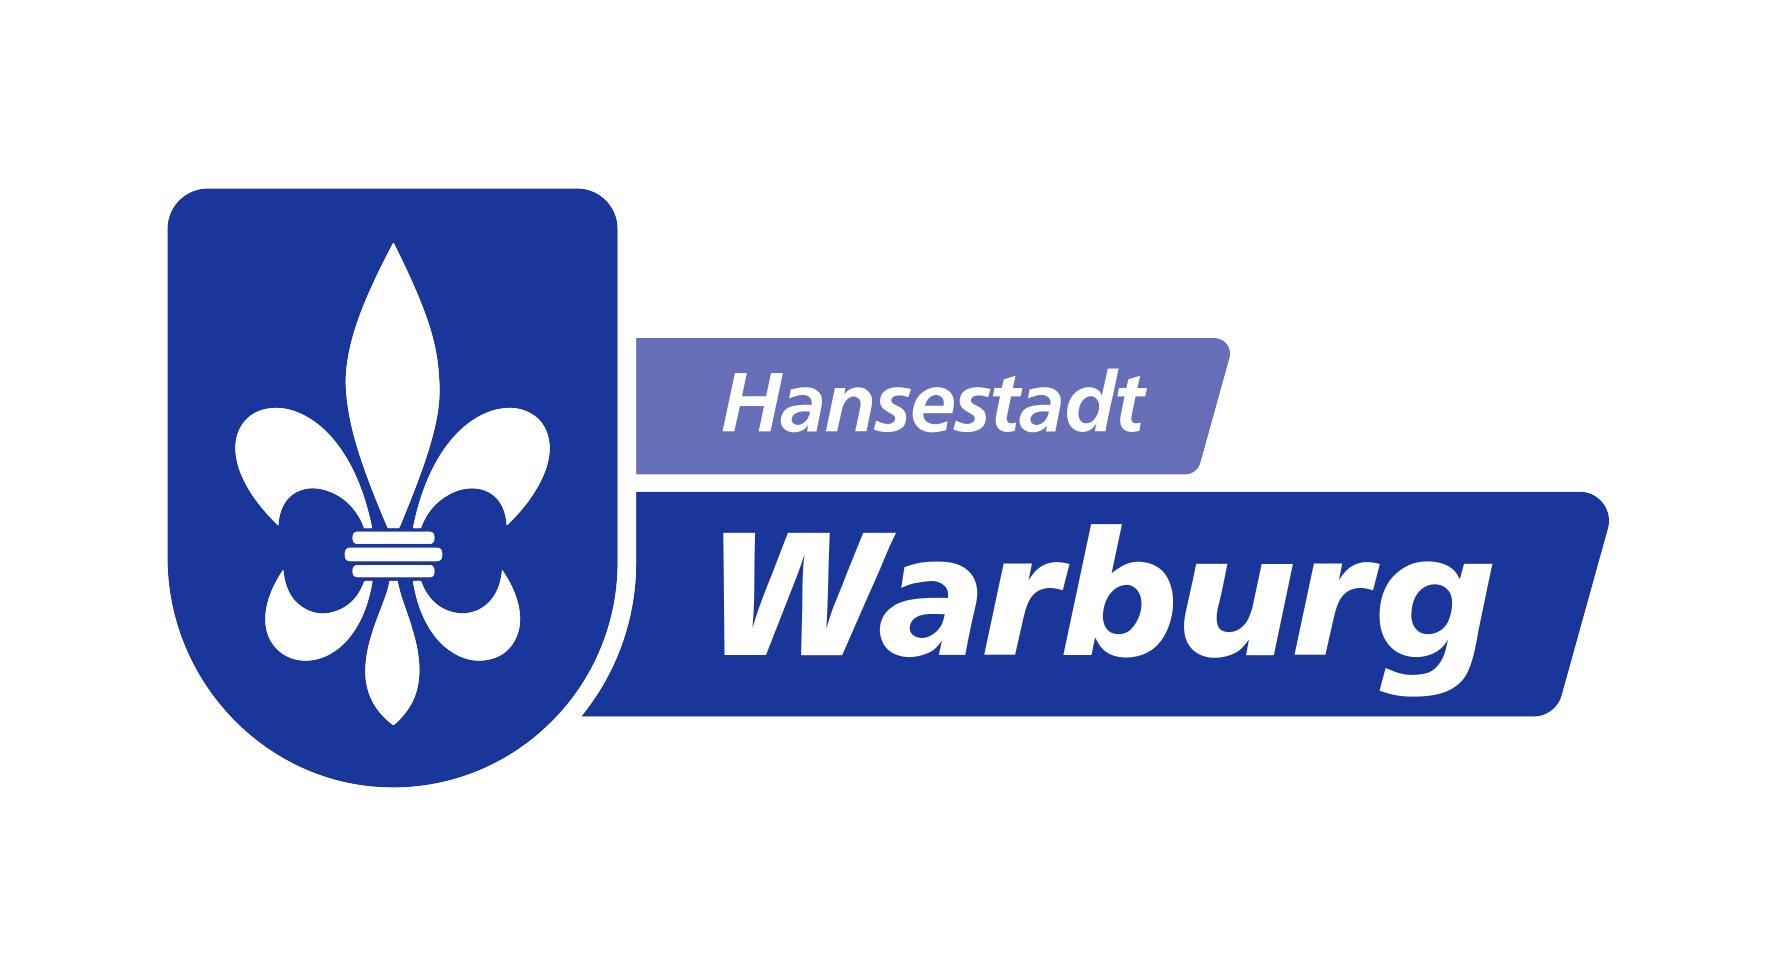 Hansestadt Warburg